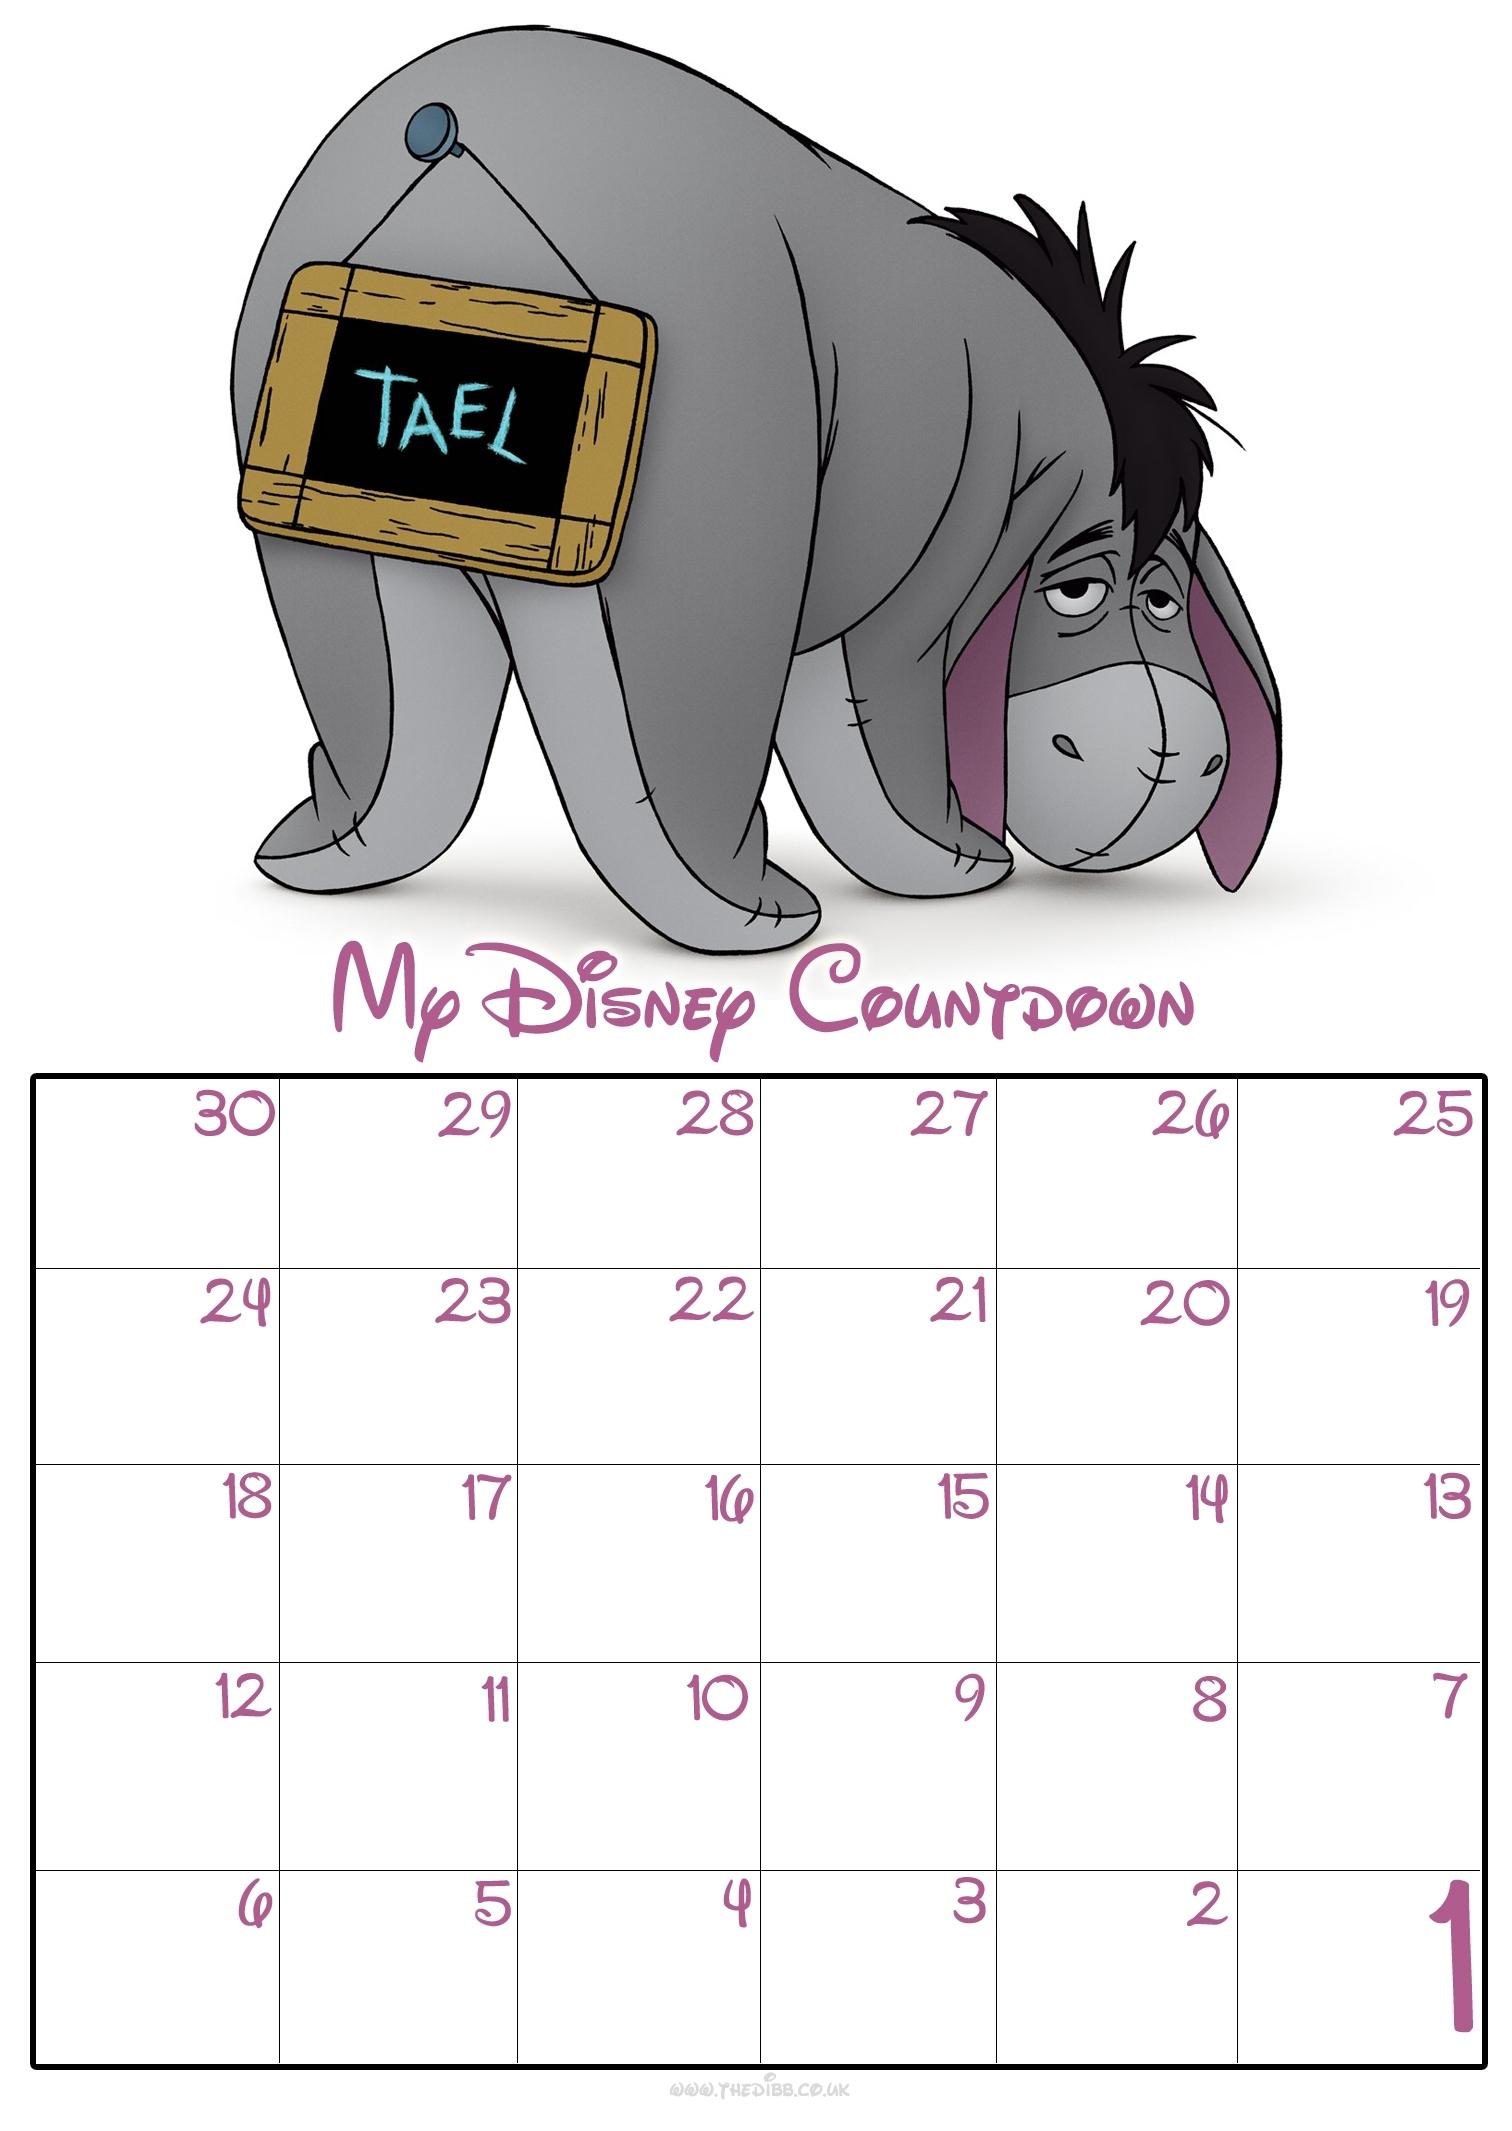 Free Download Free 30 Day Disney Countdown Calendar throughout Count Diwn Calendar Fir Disney Cruise